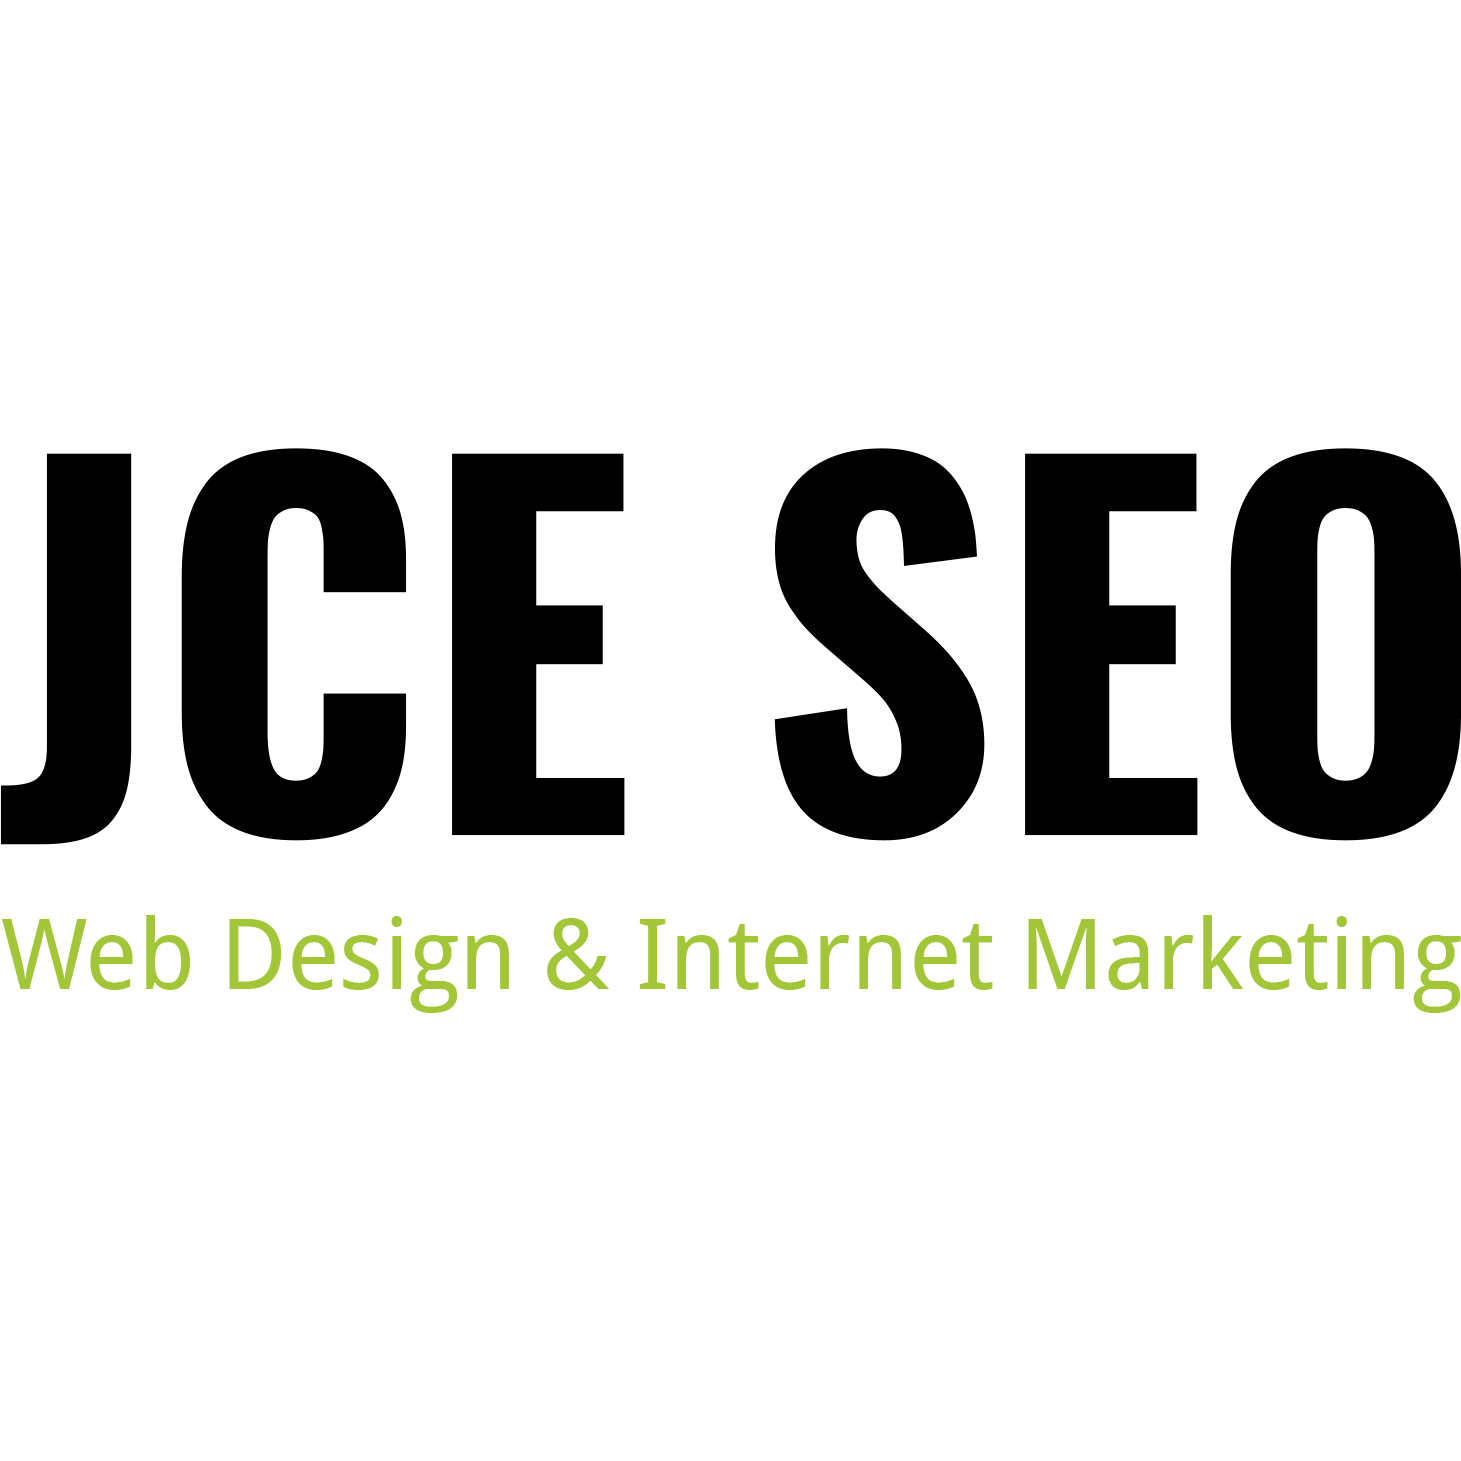 JCE SEO - Website Design & SEO Service